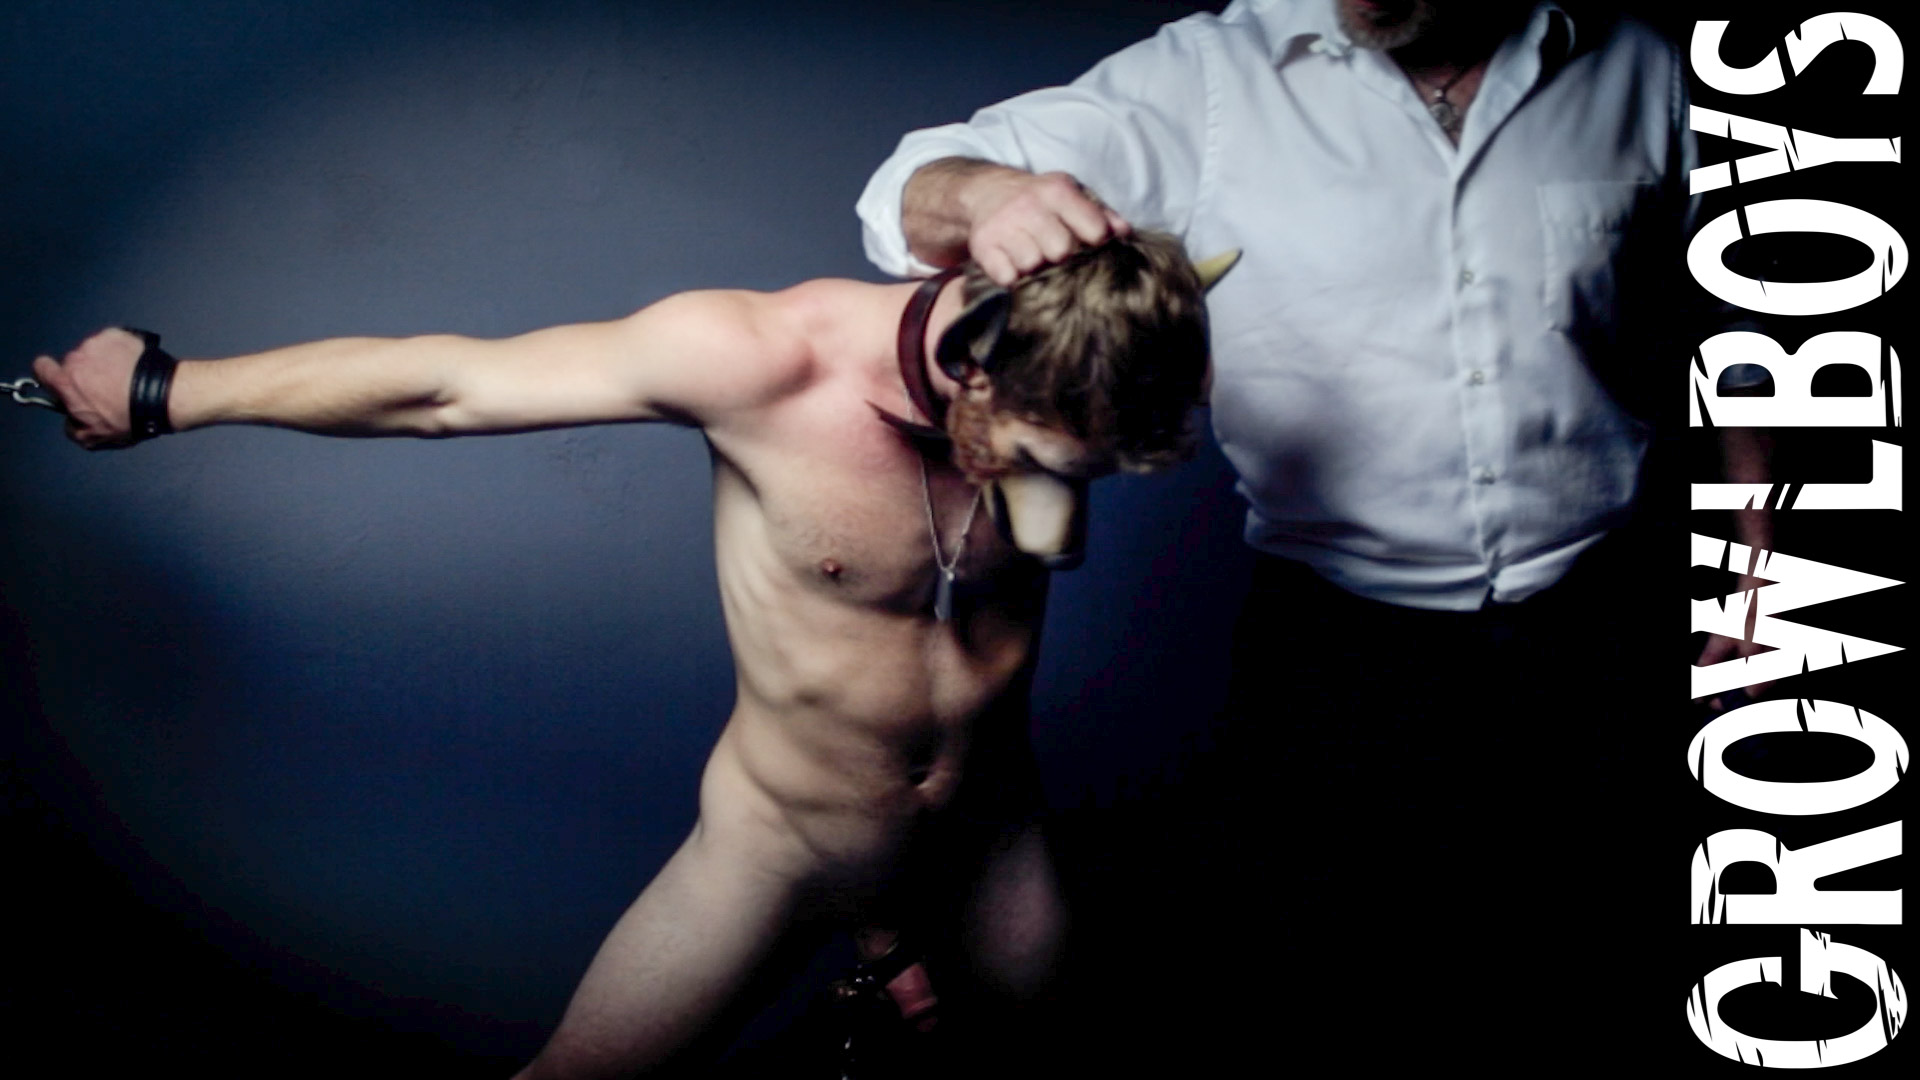 gay furry bondage porn